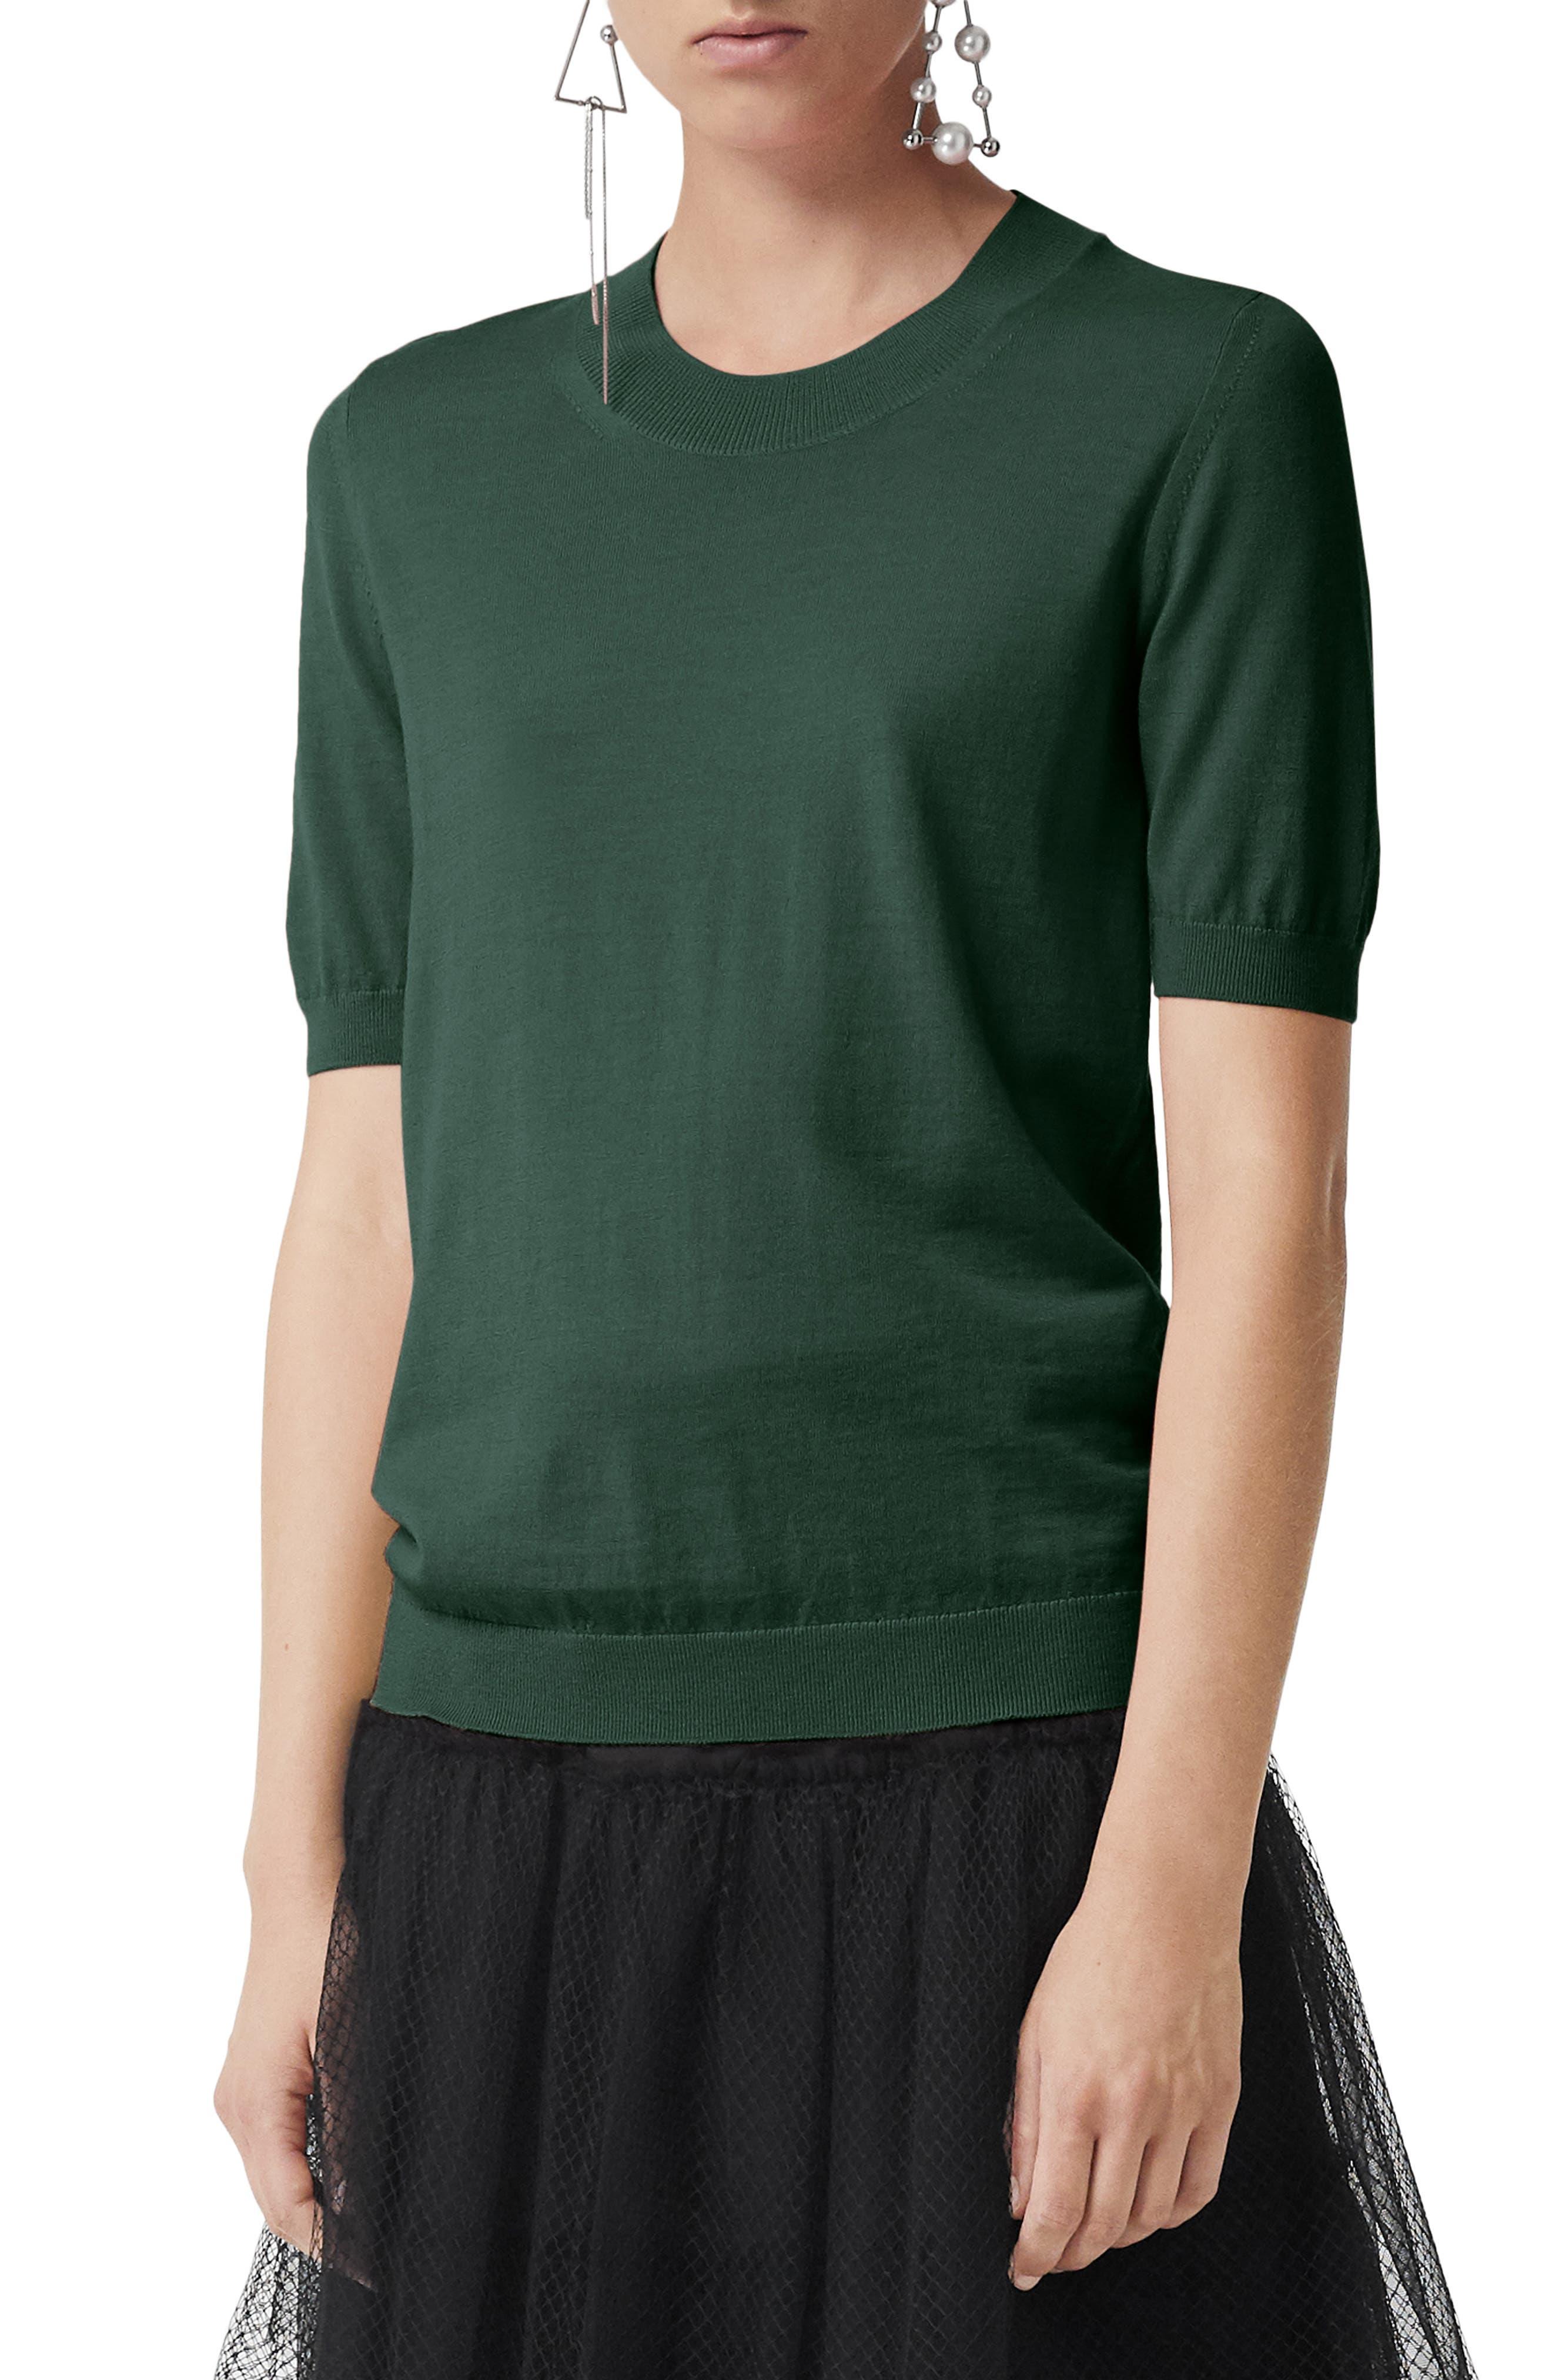 Burberry Adderstone Merino Wool Pullover, Green